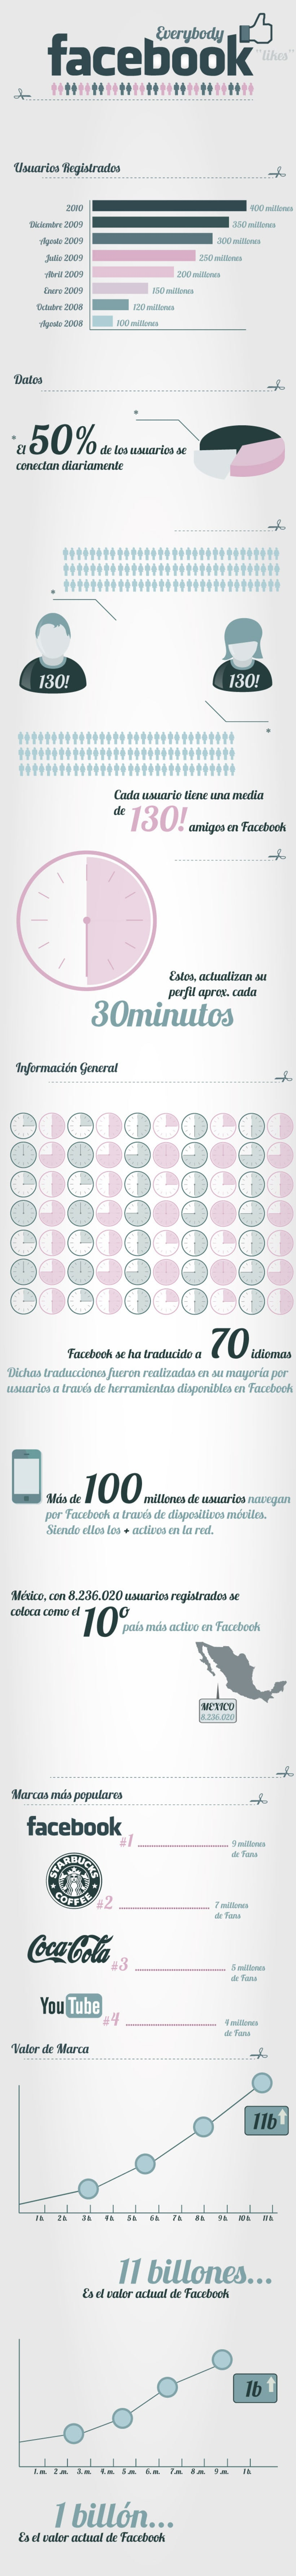 Infografia (Facebook) 1